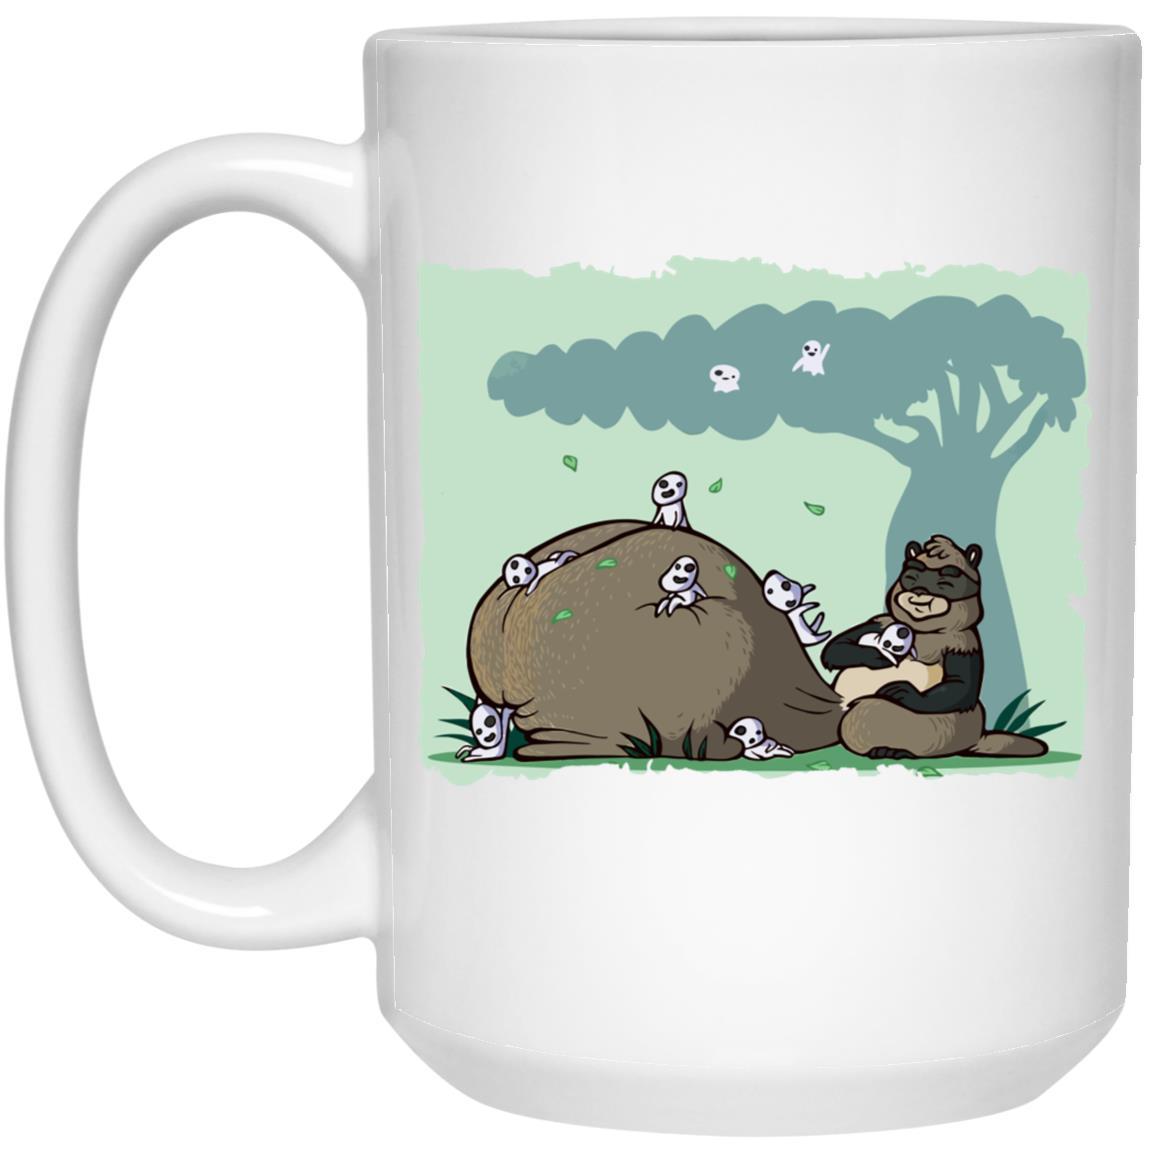 Pom Poko and the Tree Spirits Mug